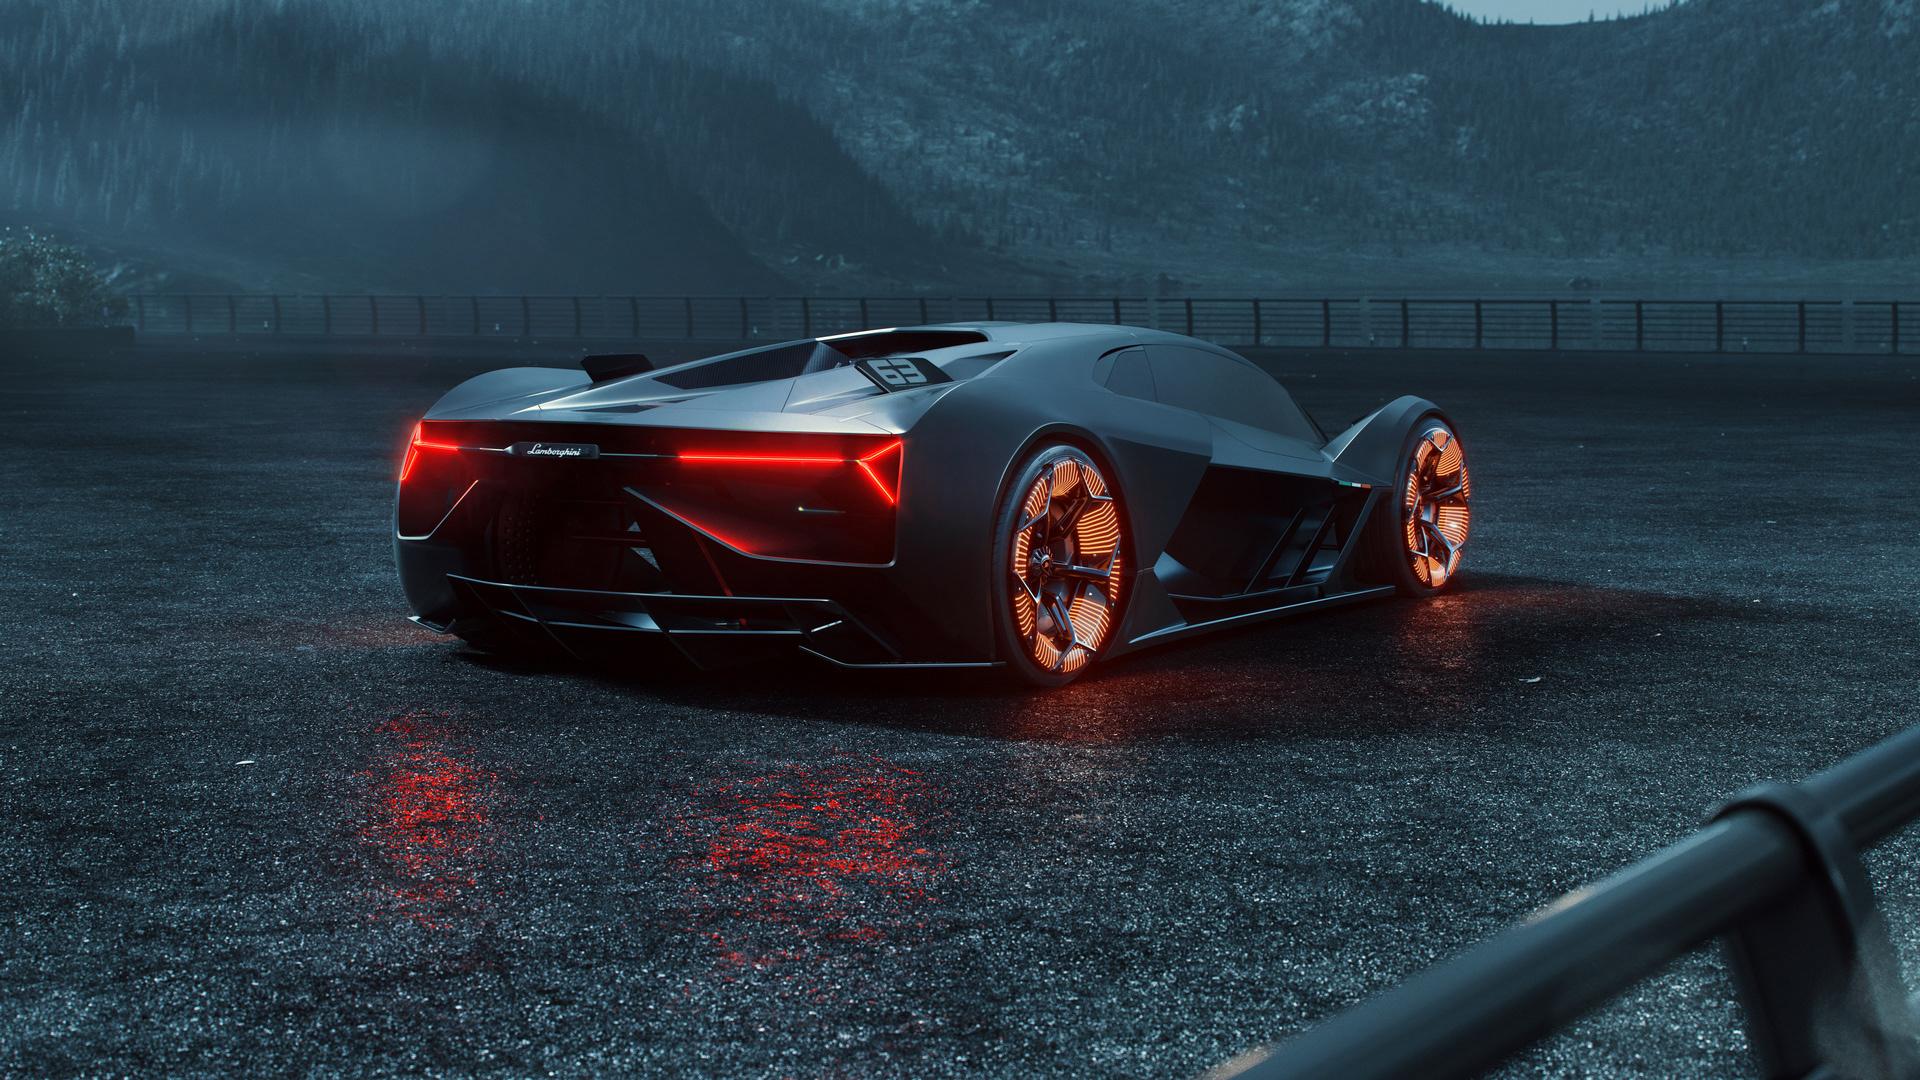 2019 Lamborghini Terzo Millennio Hd Hd Cars 4k Wallpapers Images